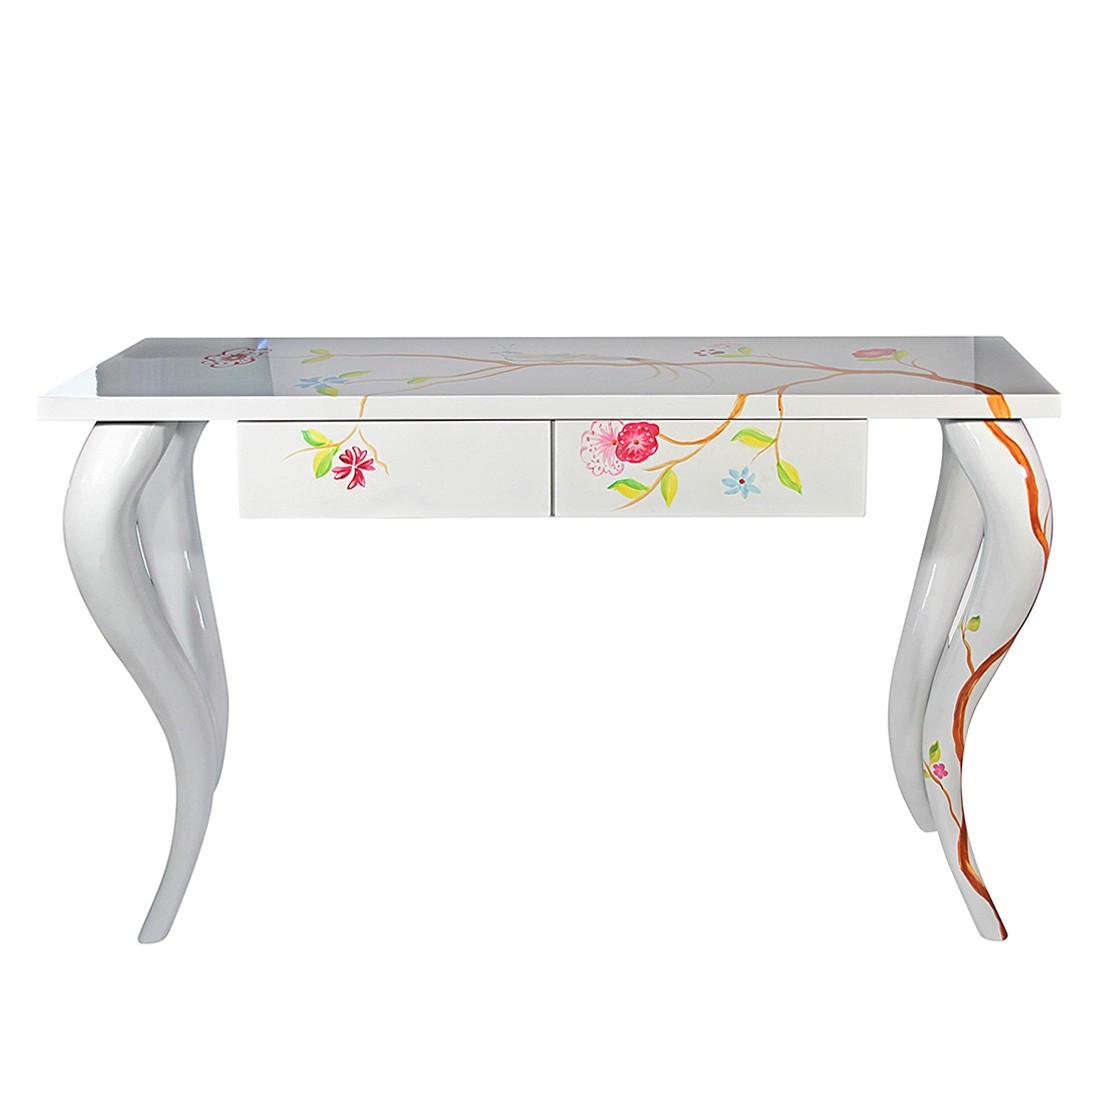 kleine meubels Wandtafel Kirschblüte - hoogglans wit Art for living ...